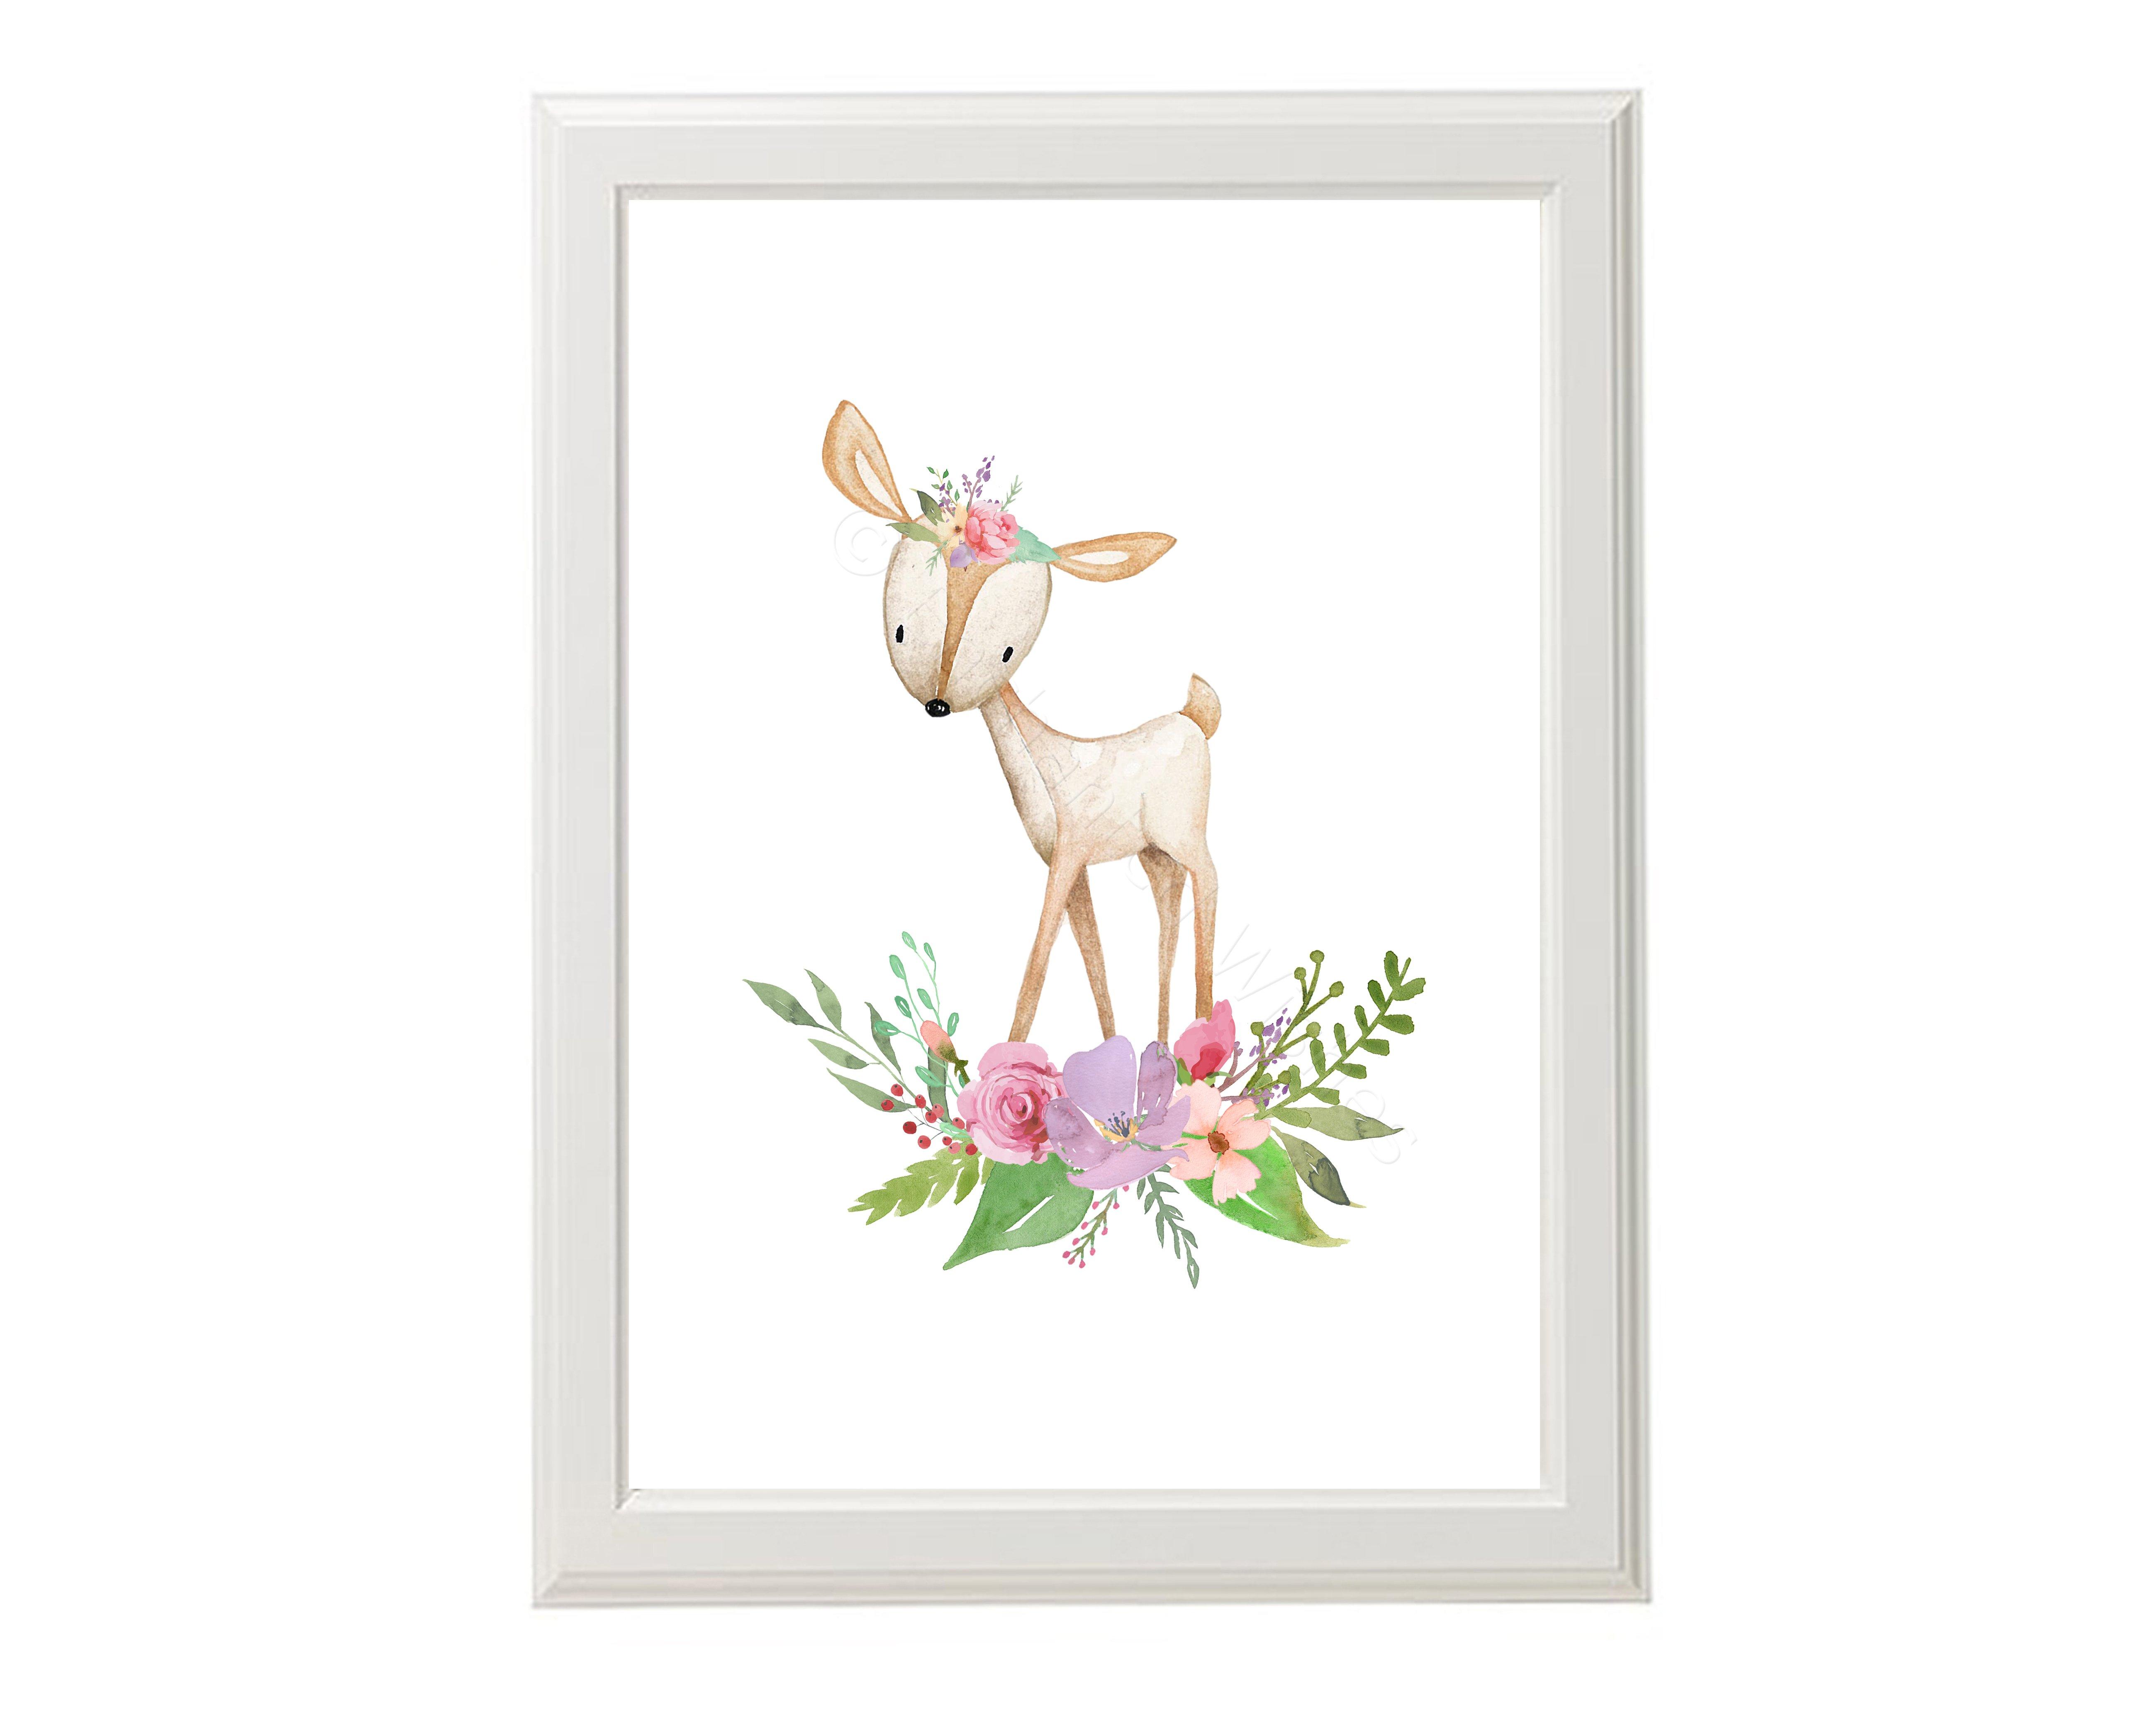 Set Of 4 Boho Woodland Animals Nursery Decor Prints Art Prints Nursery Wall Art Quote